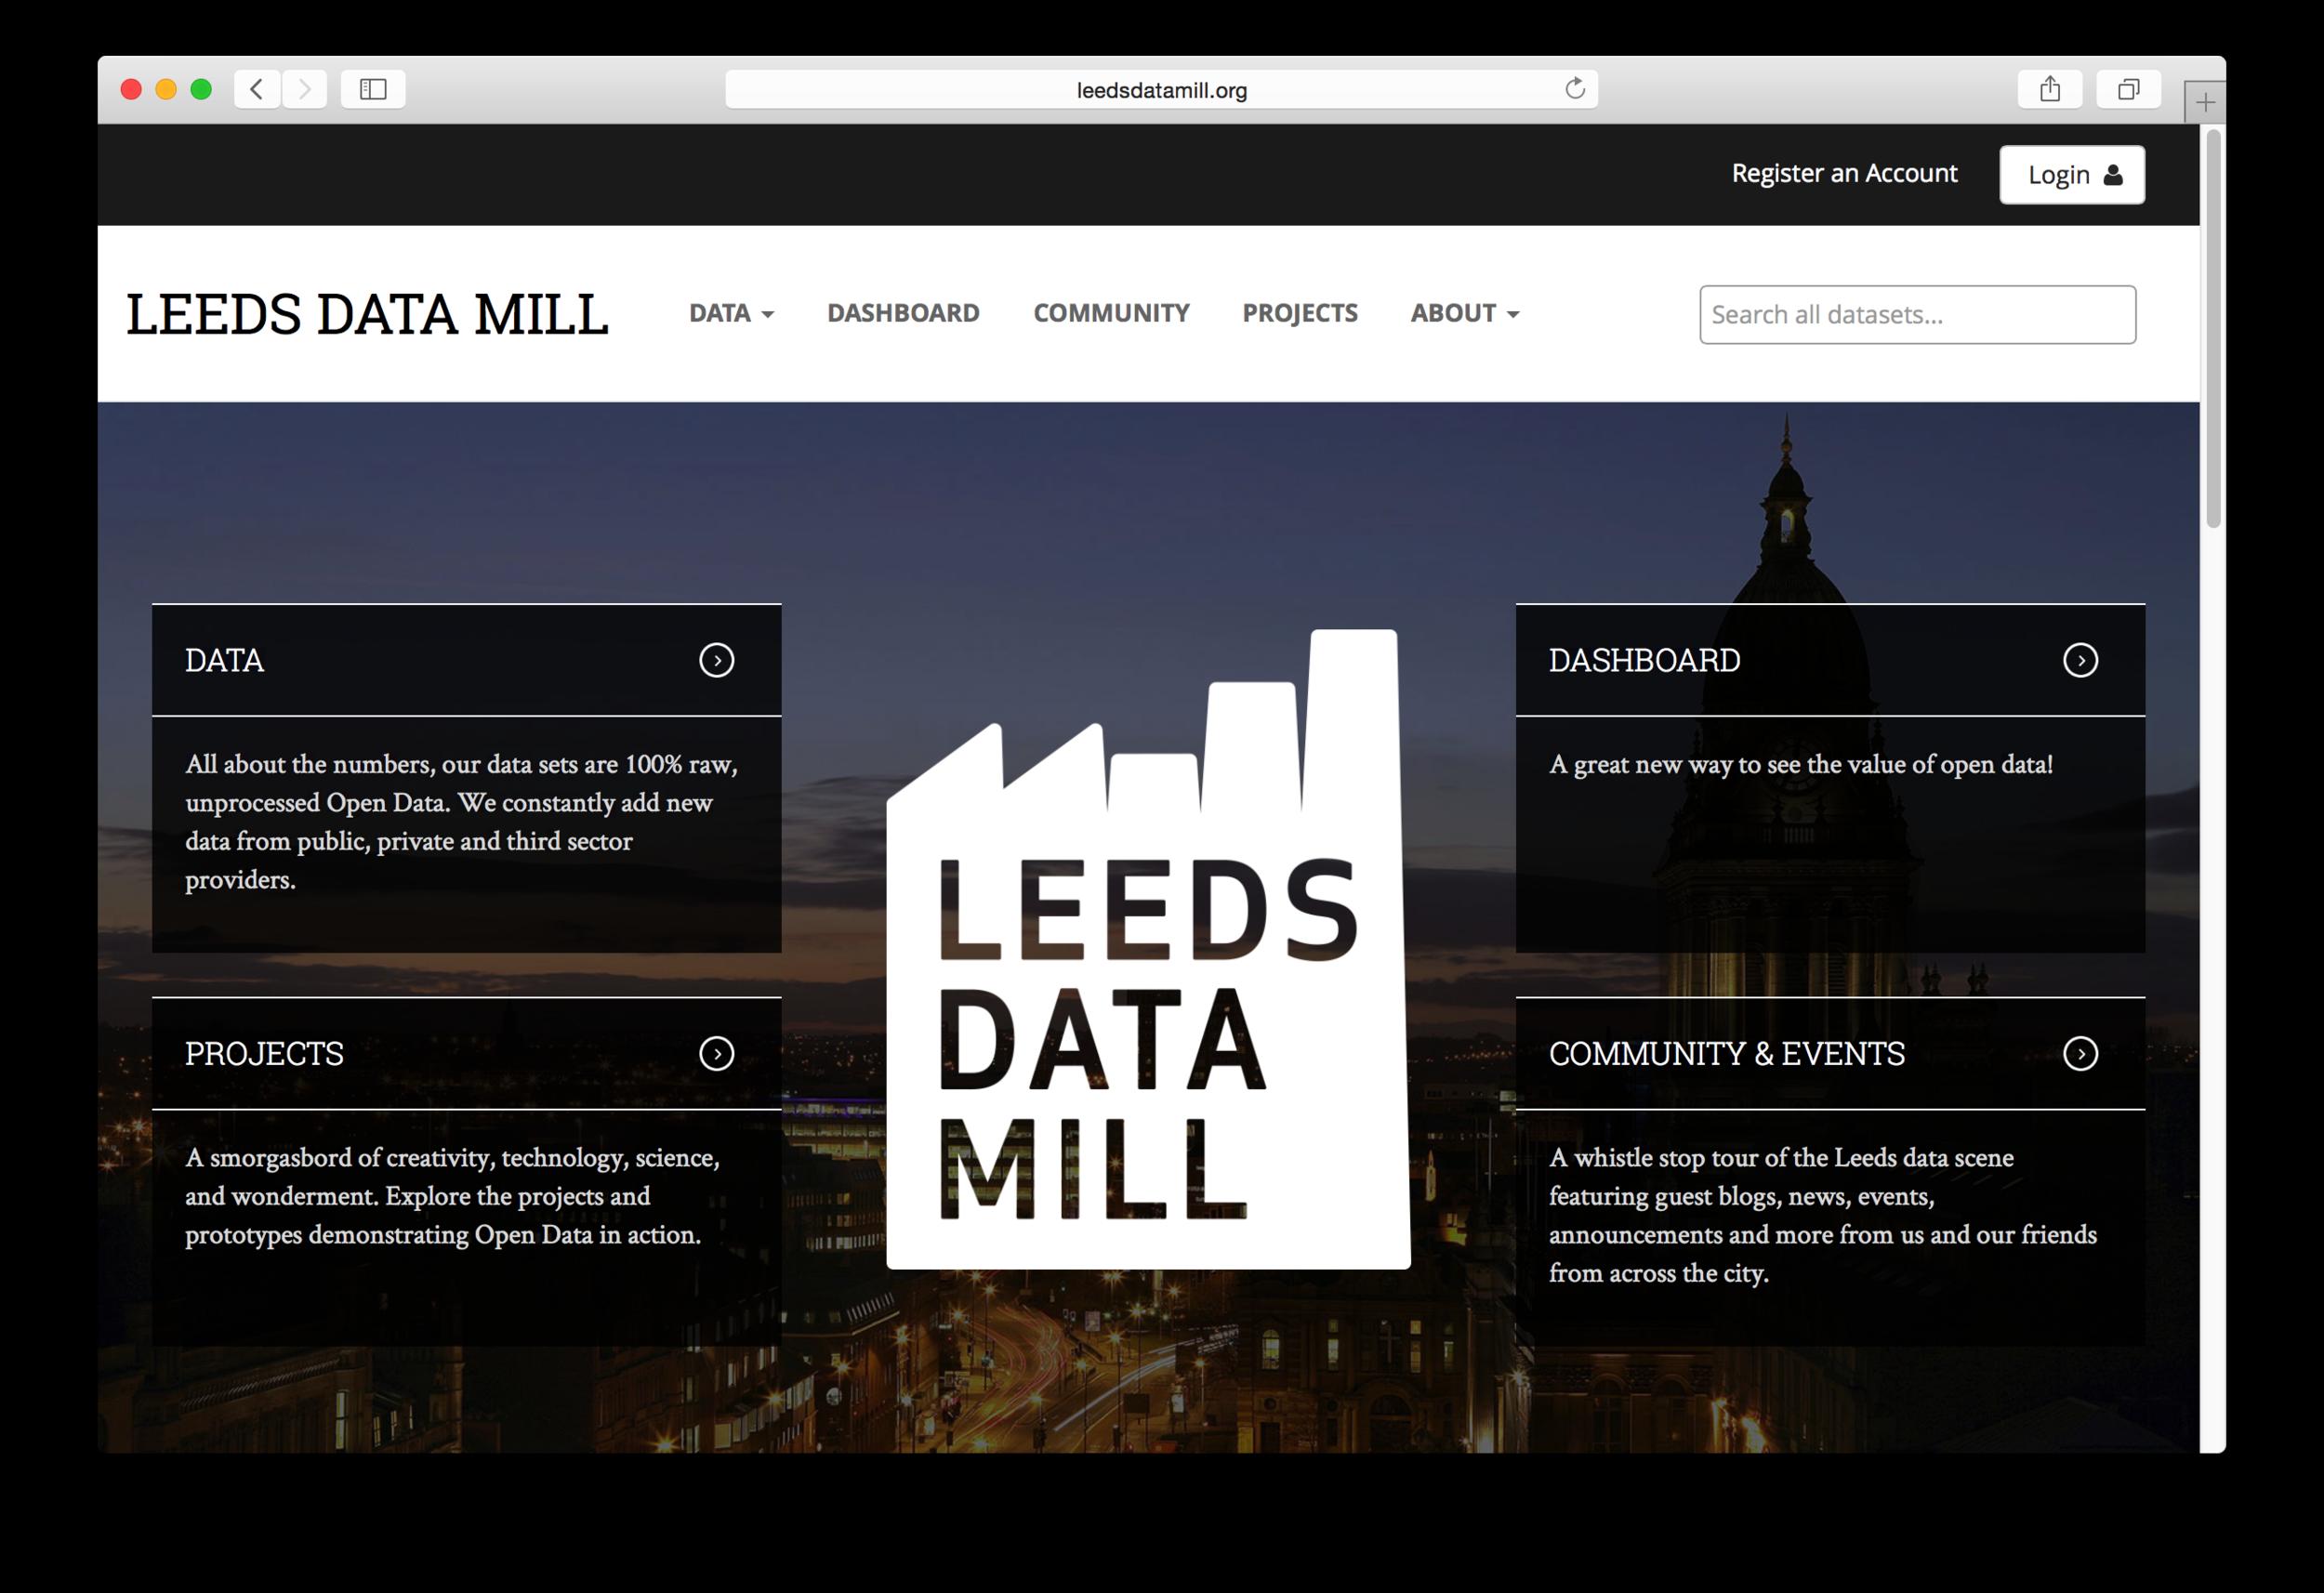 www.leedsdatamill.org